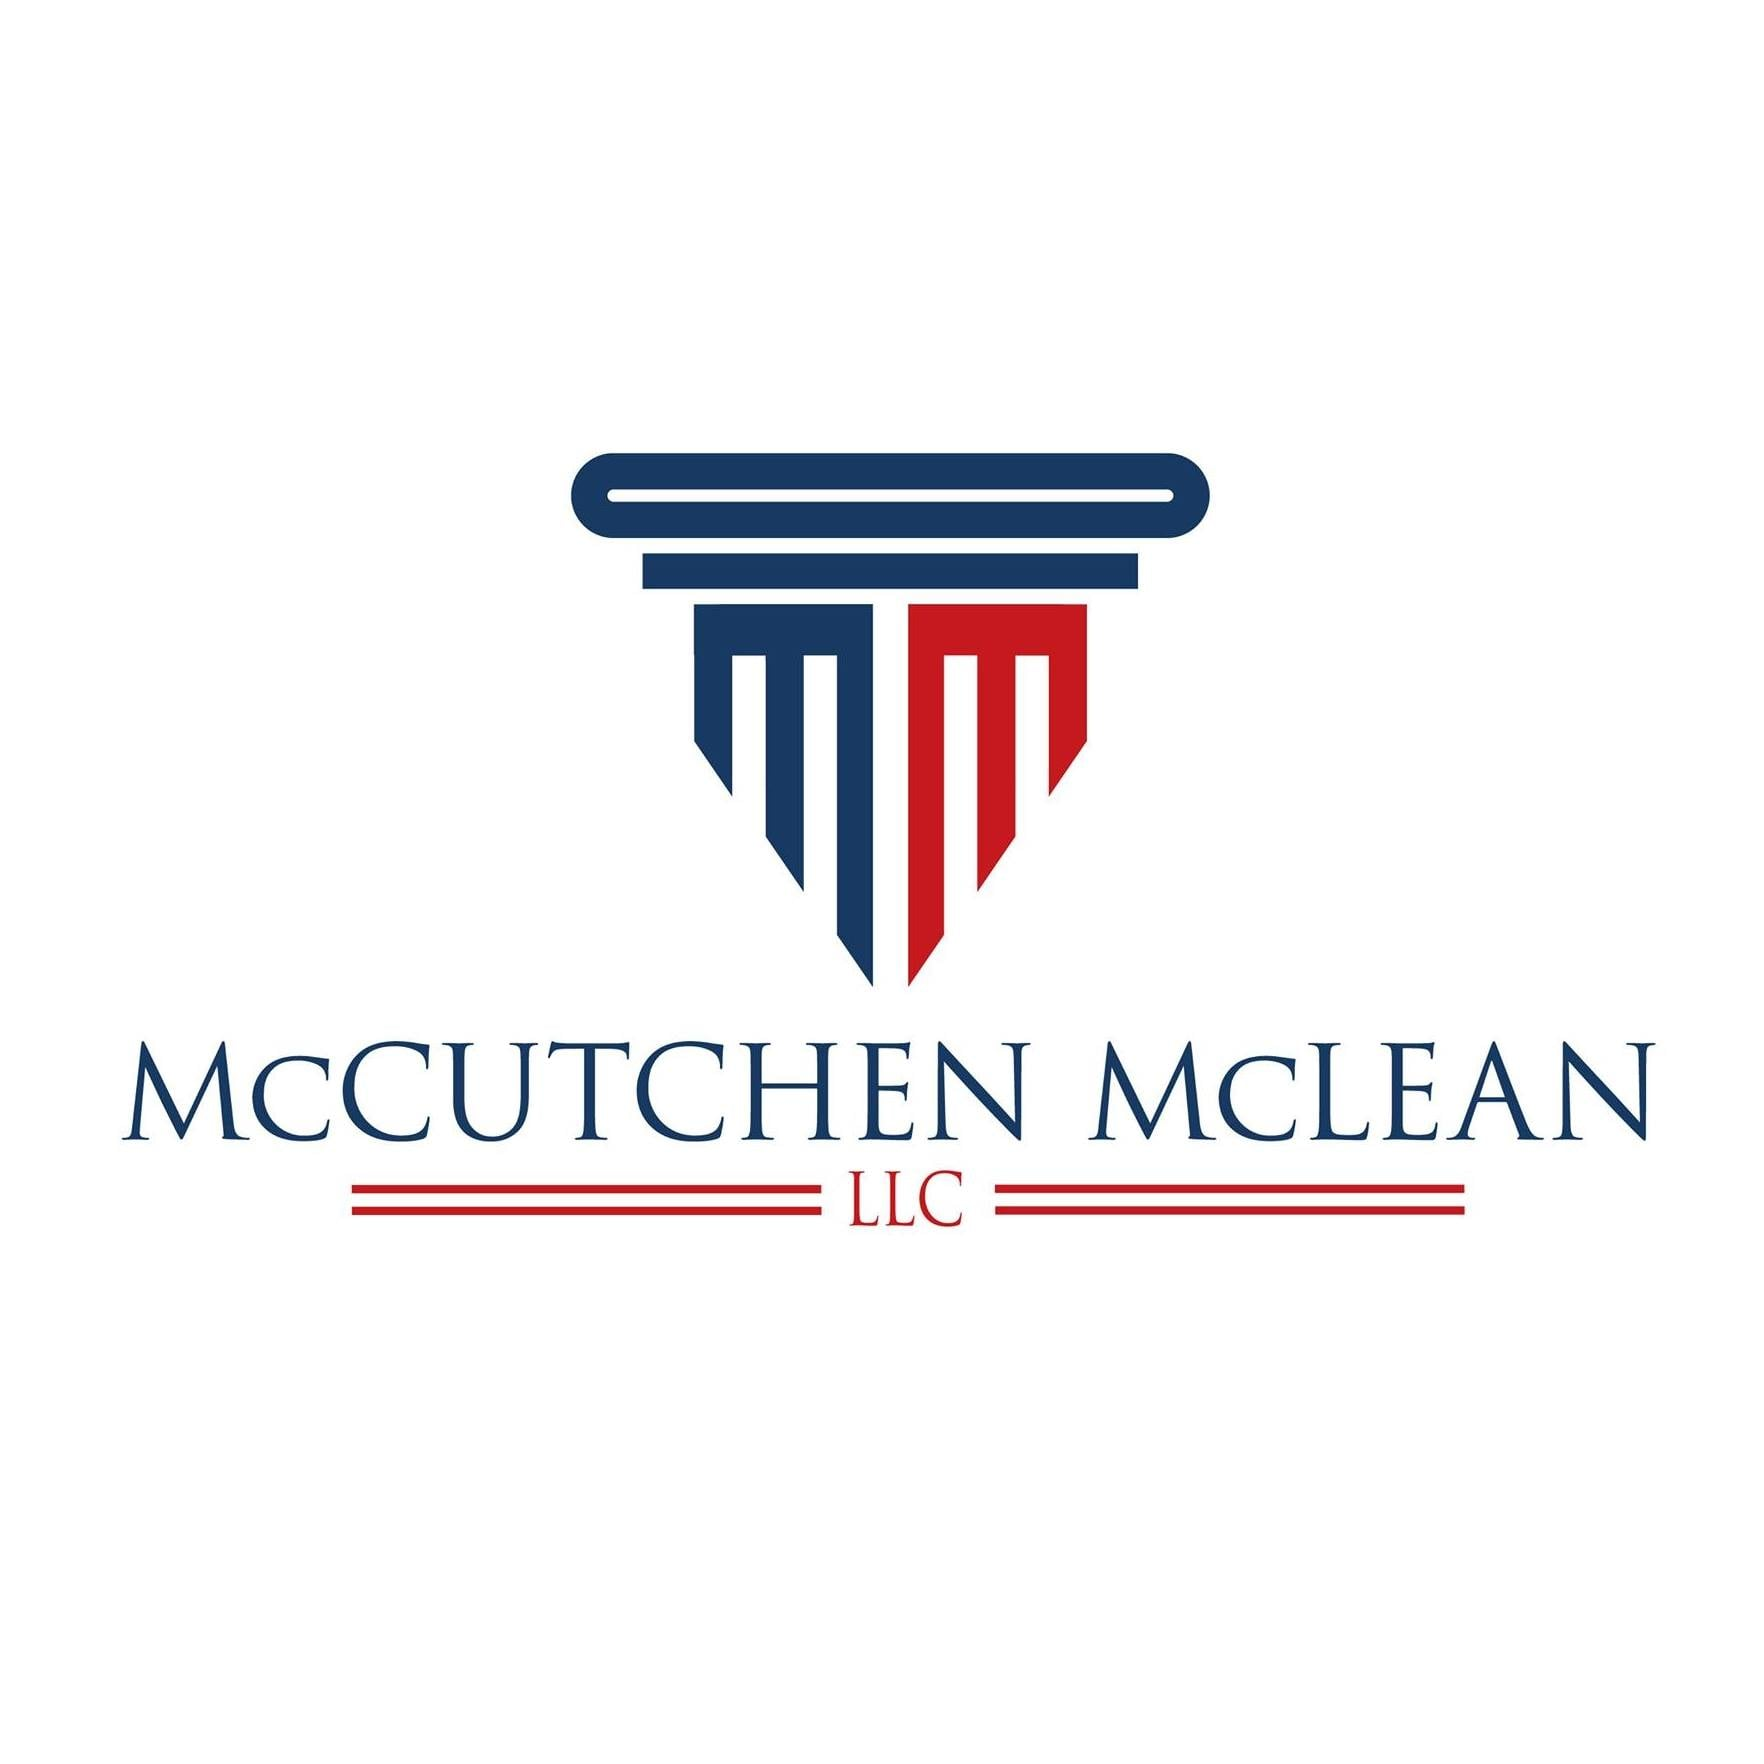 McCutchen McLean, LLC